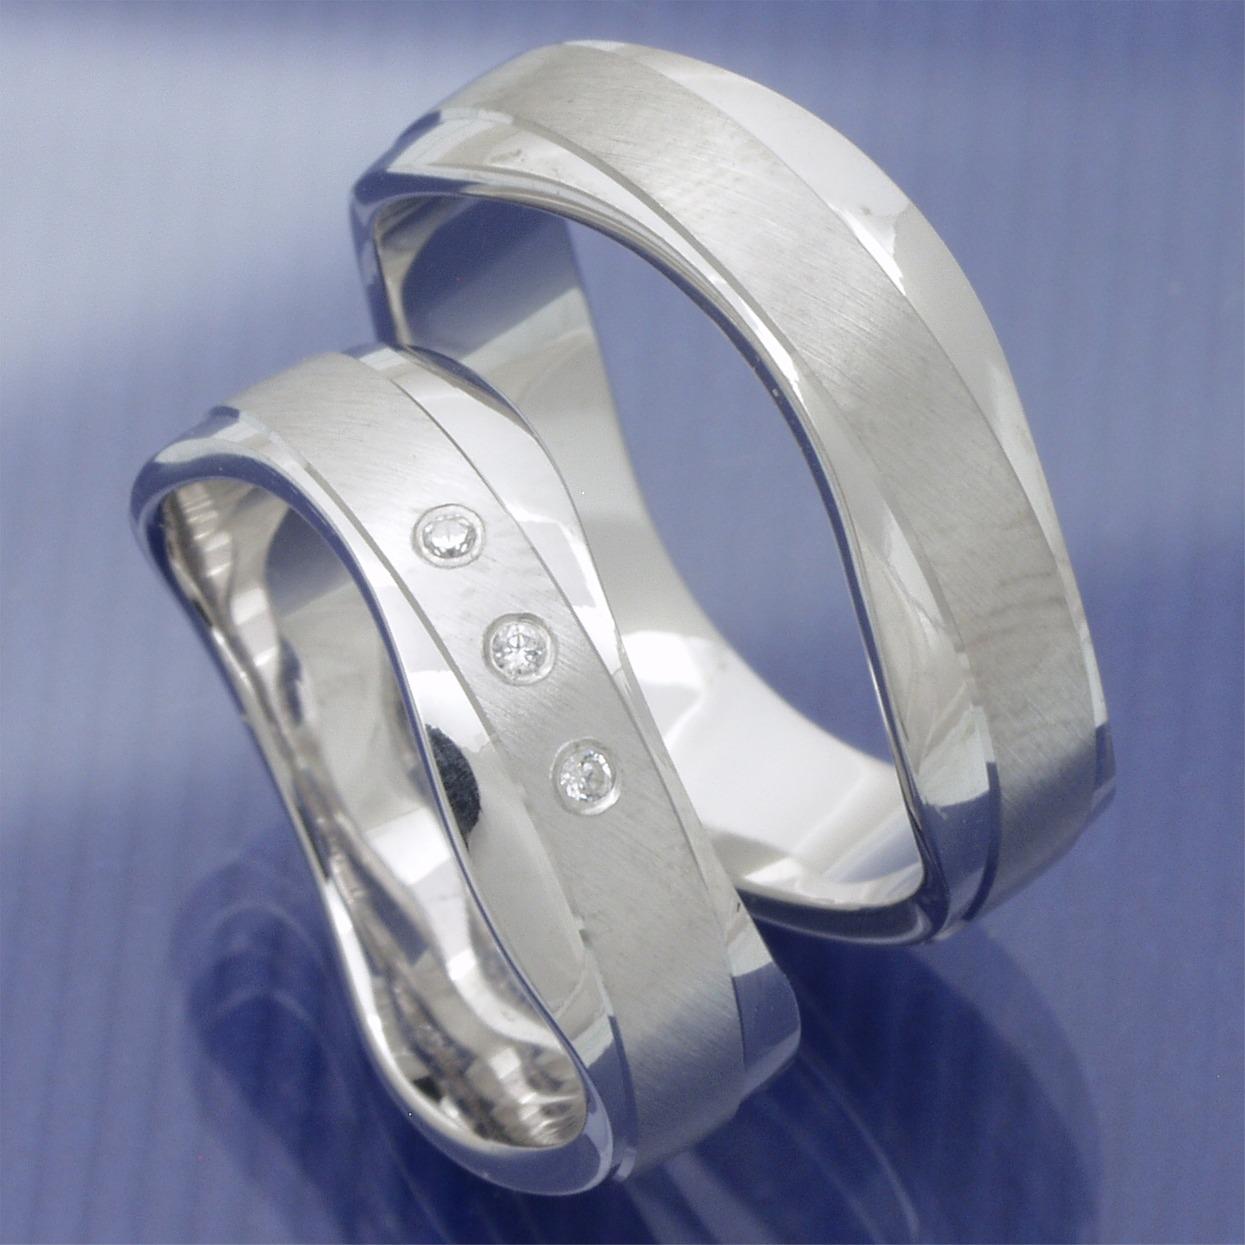 EheringeShop  Silber Partnerringe Verlobungsringe Modell Brandon PB300803